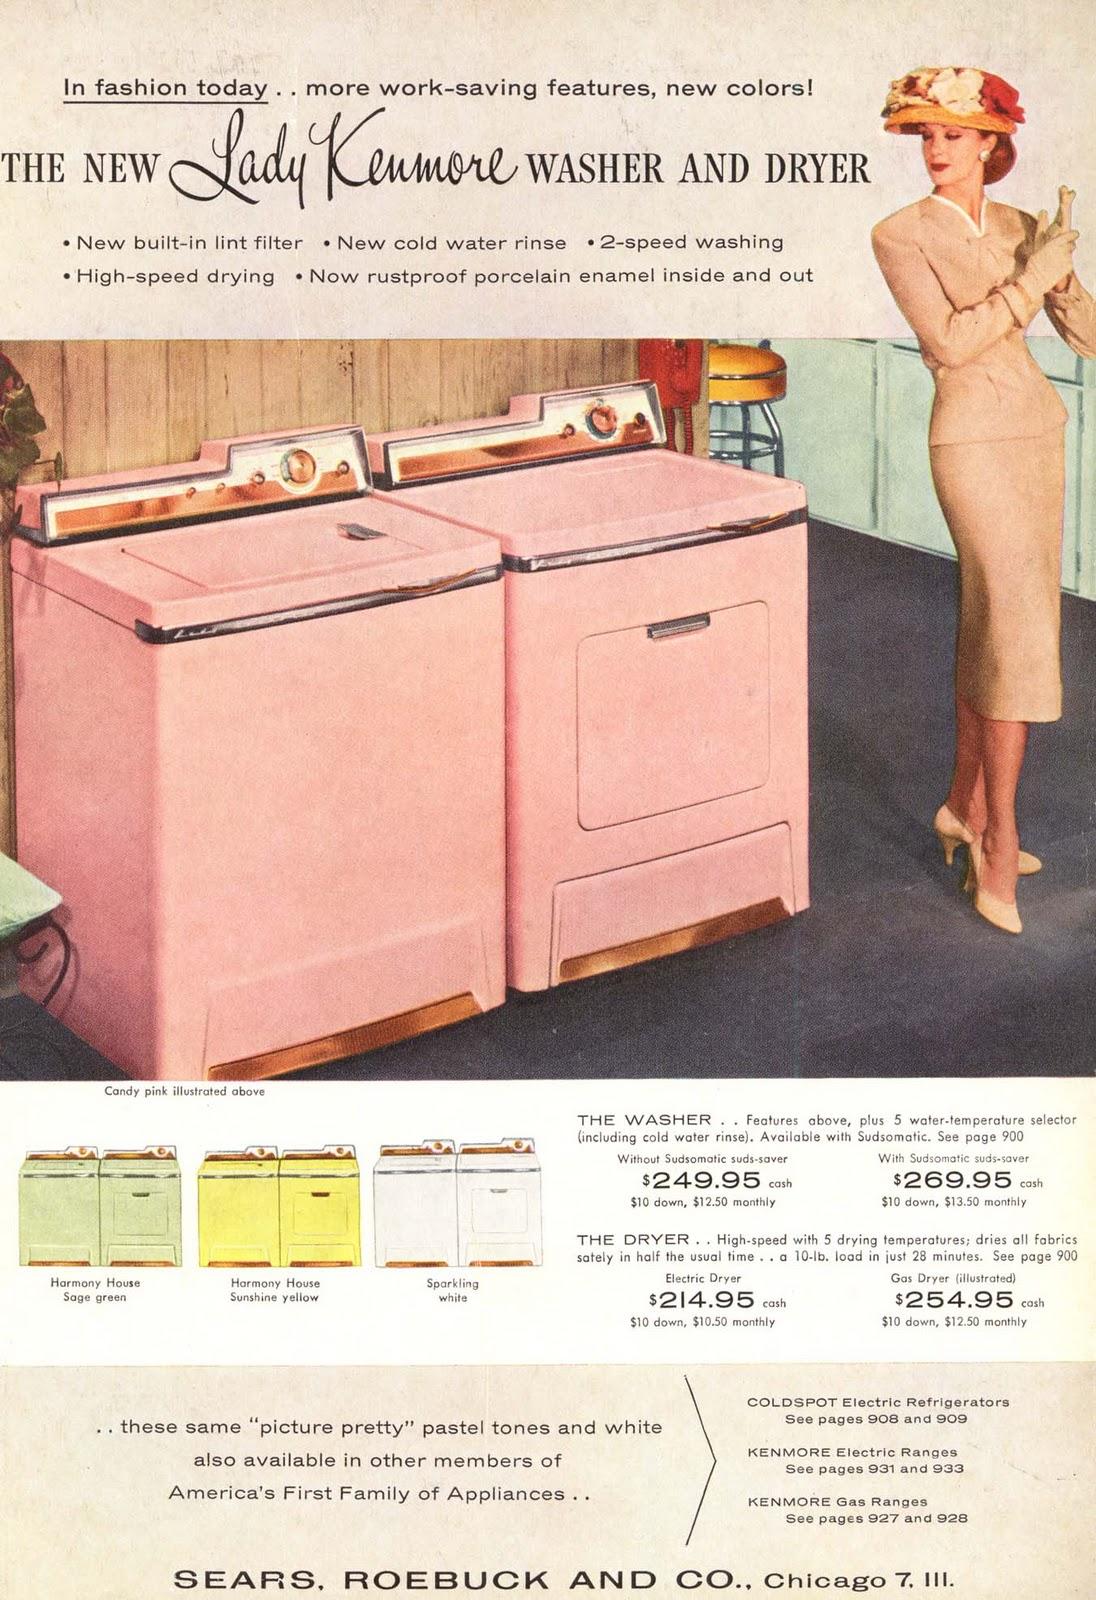 http://4.bp.blogspot.com/-m2t0q6kfXBo/TY_1oD-ErfI/AAAAAAAAAJw/T484zKdcjqk/s1600/Pink+Washer+%2526+Dryer+Ad.jpg